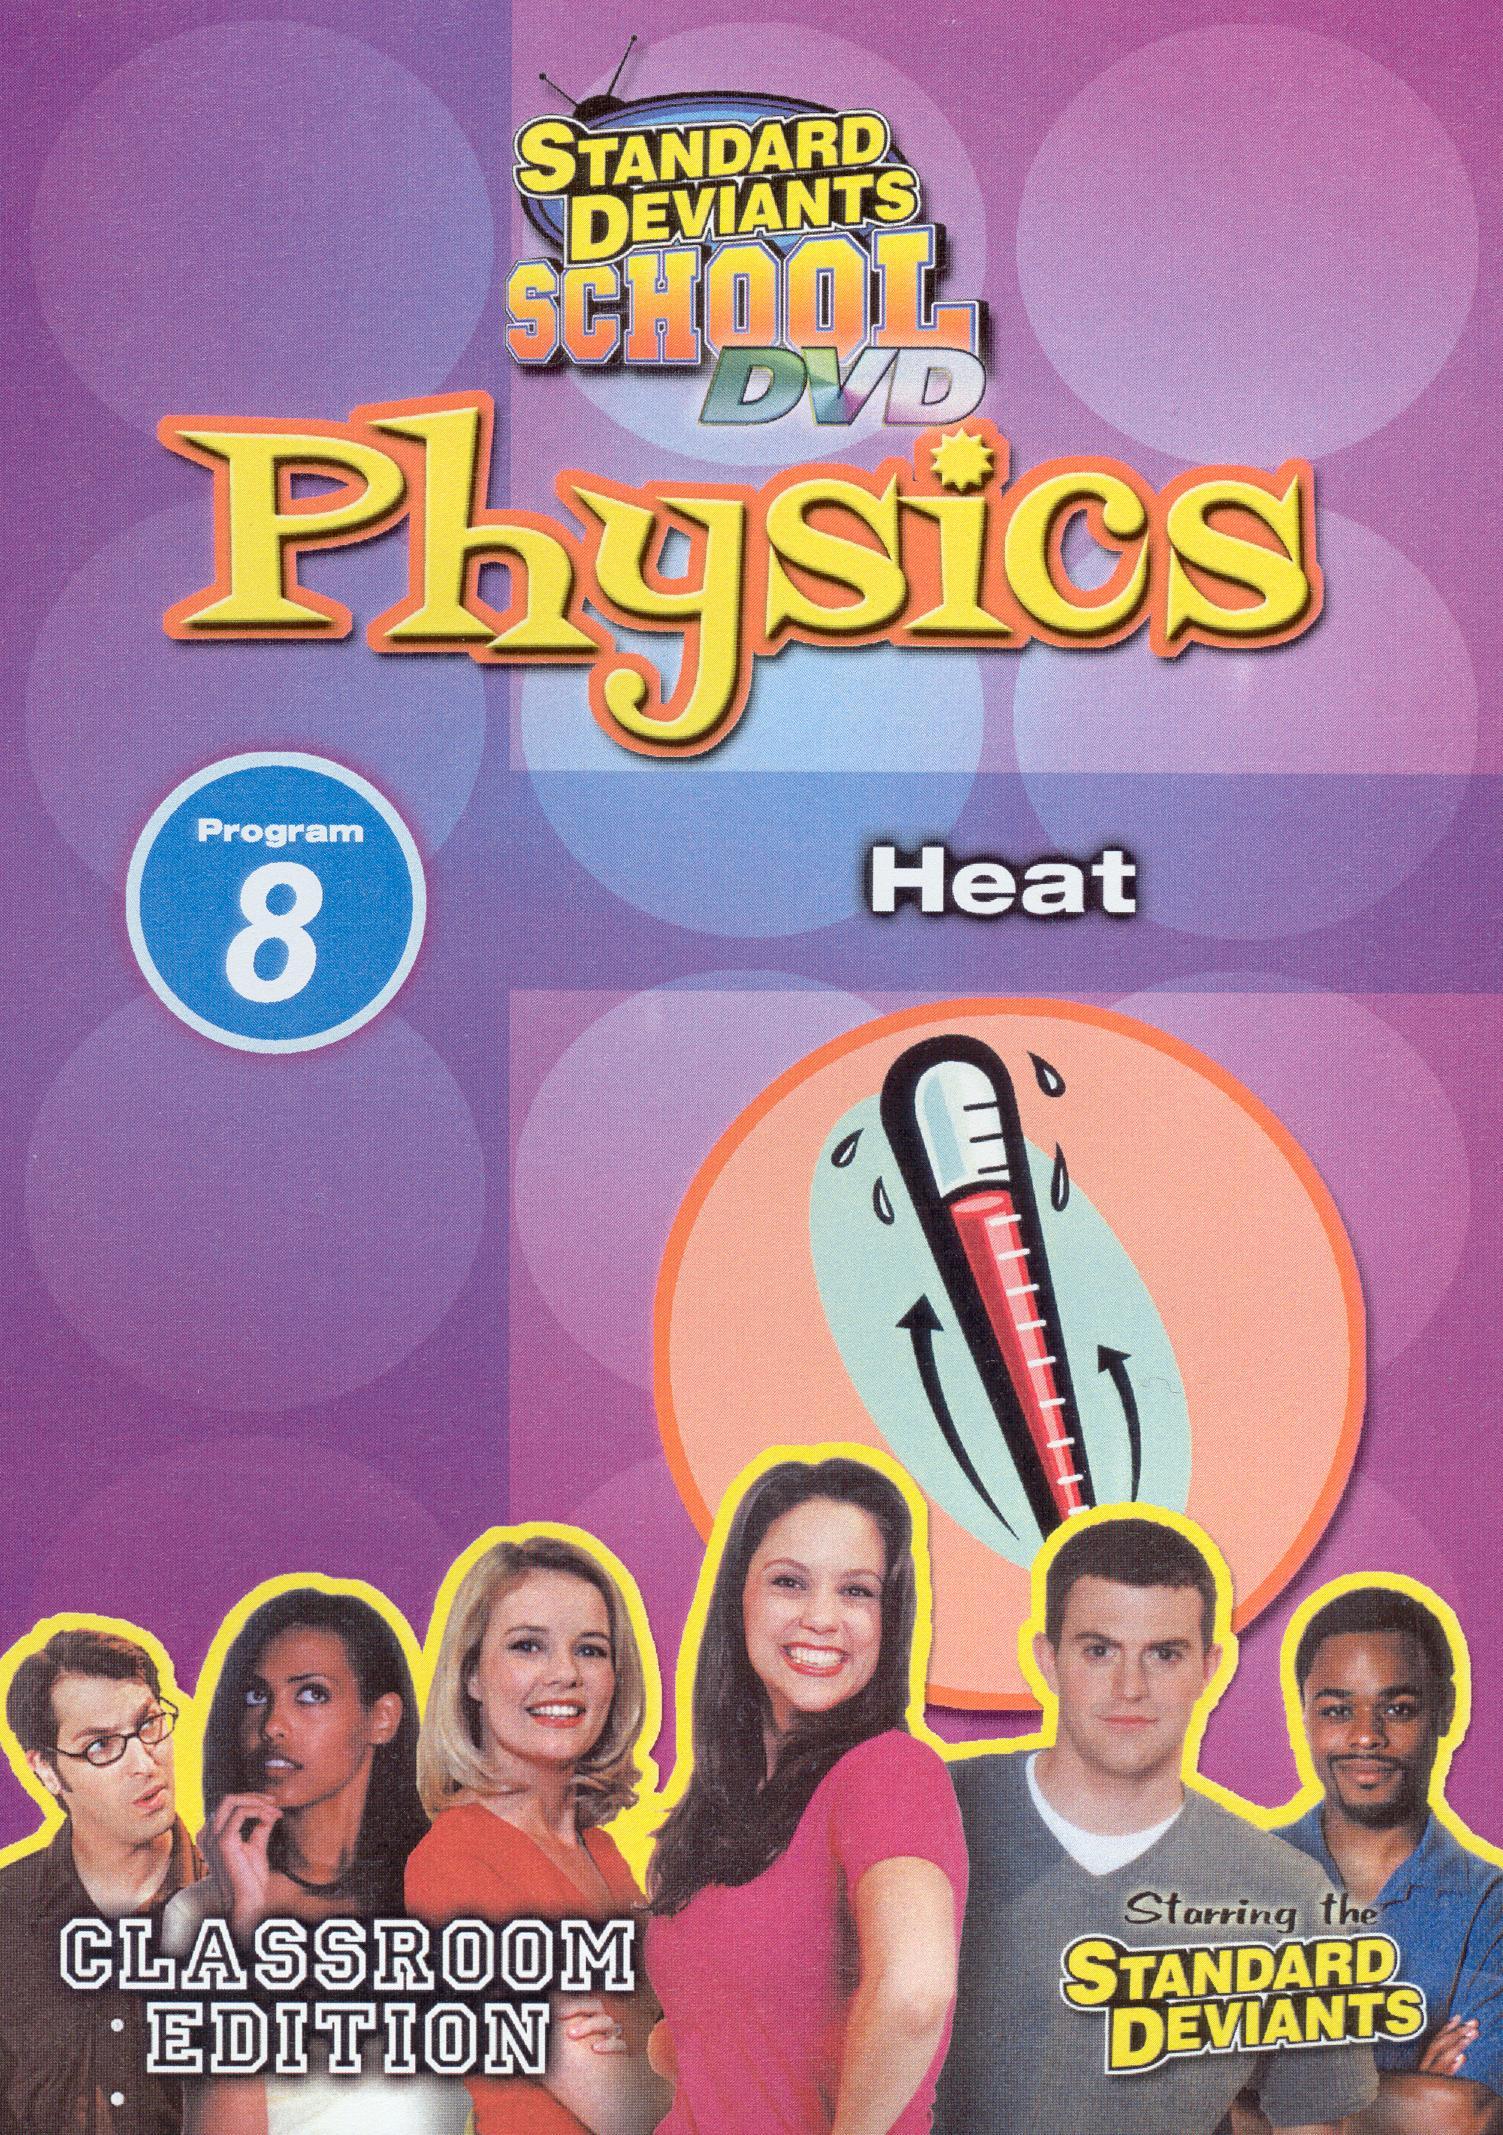 Standard Deviants School: Physics, Program 8 - Heat